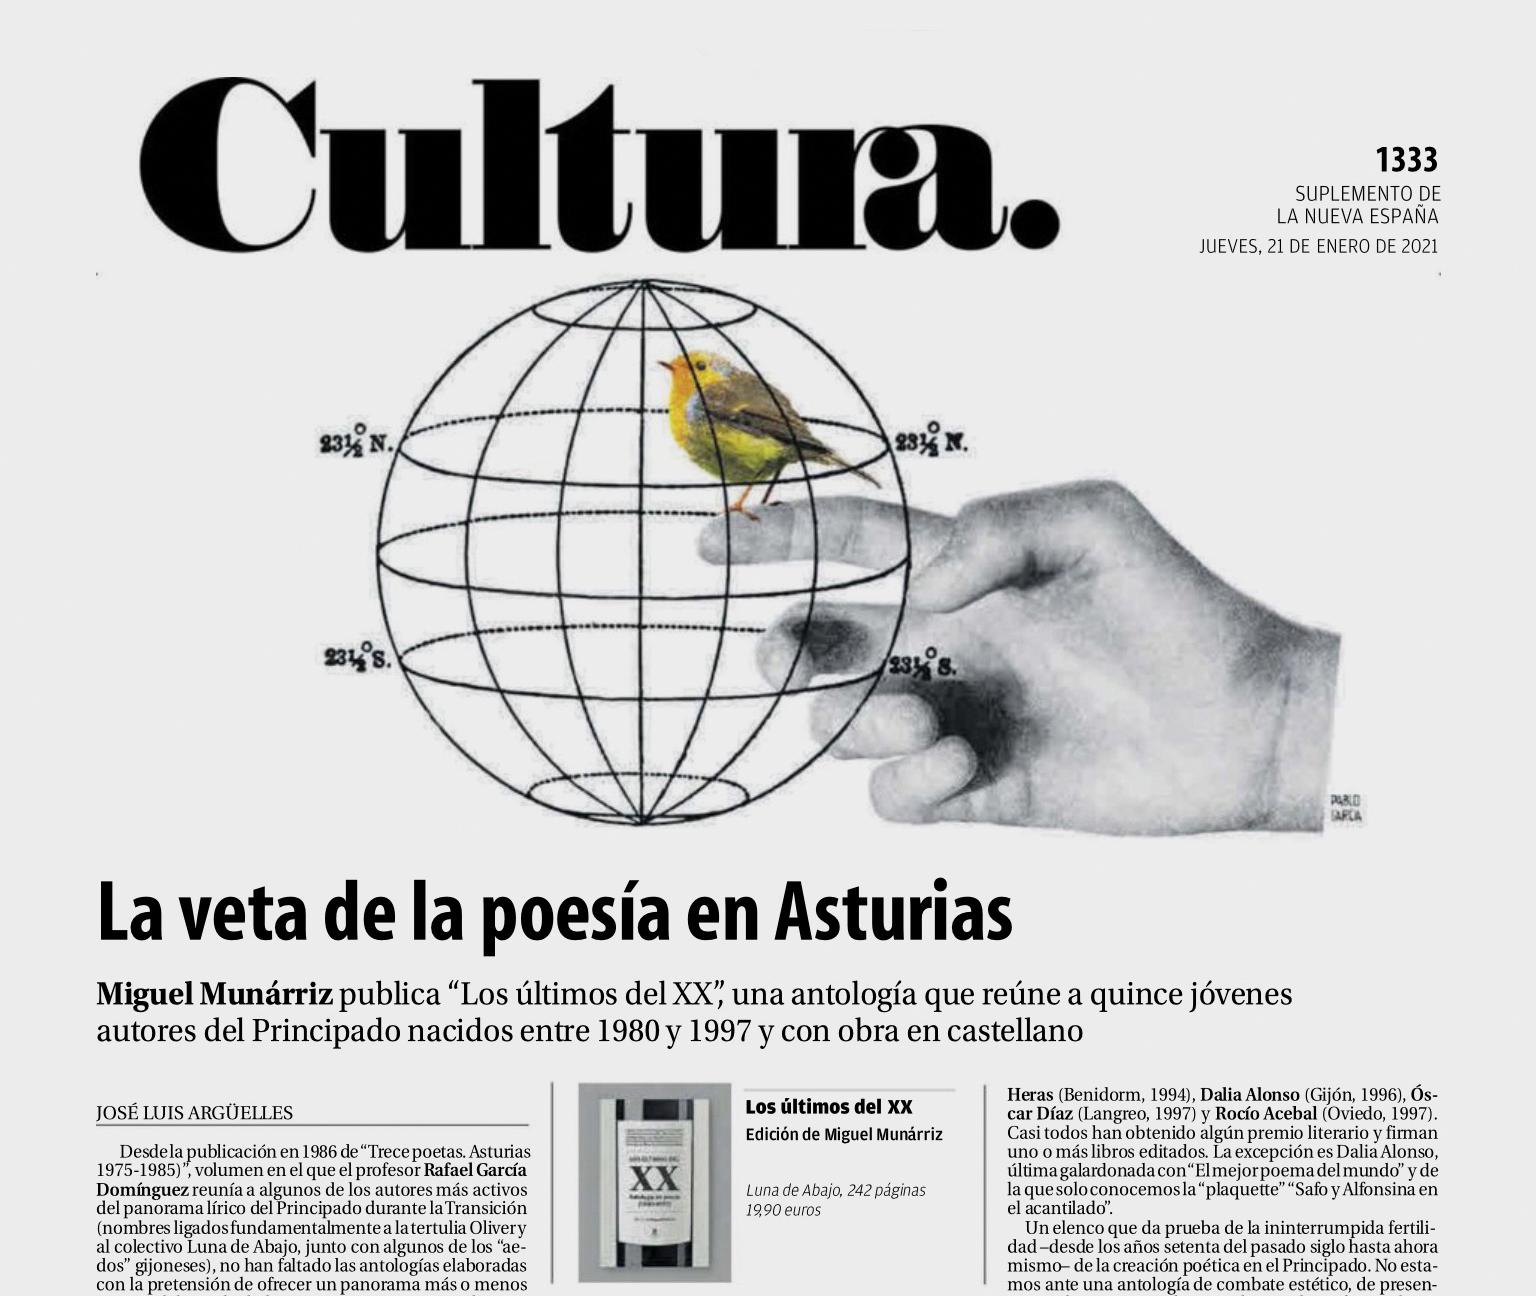 La veta de la poesía en Asturias